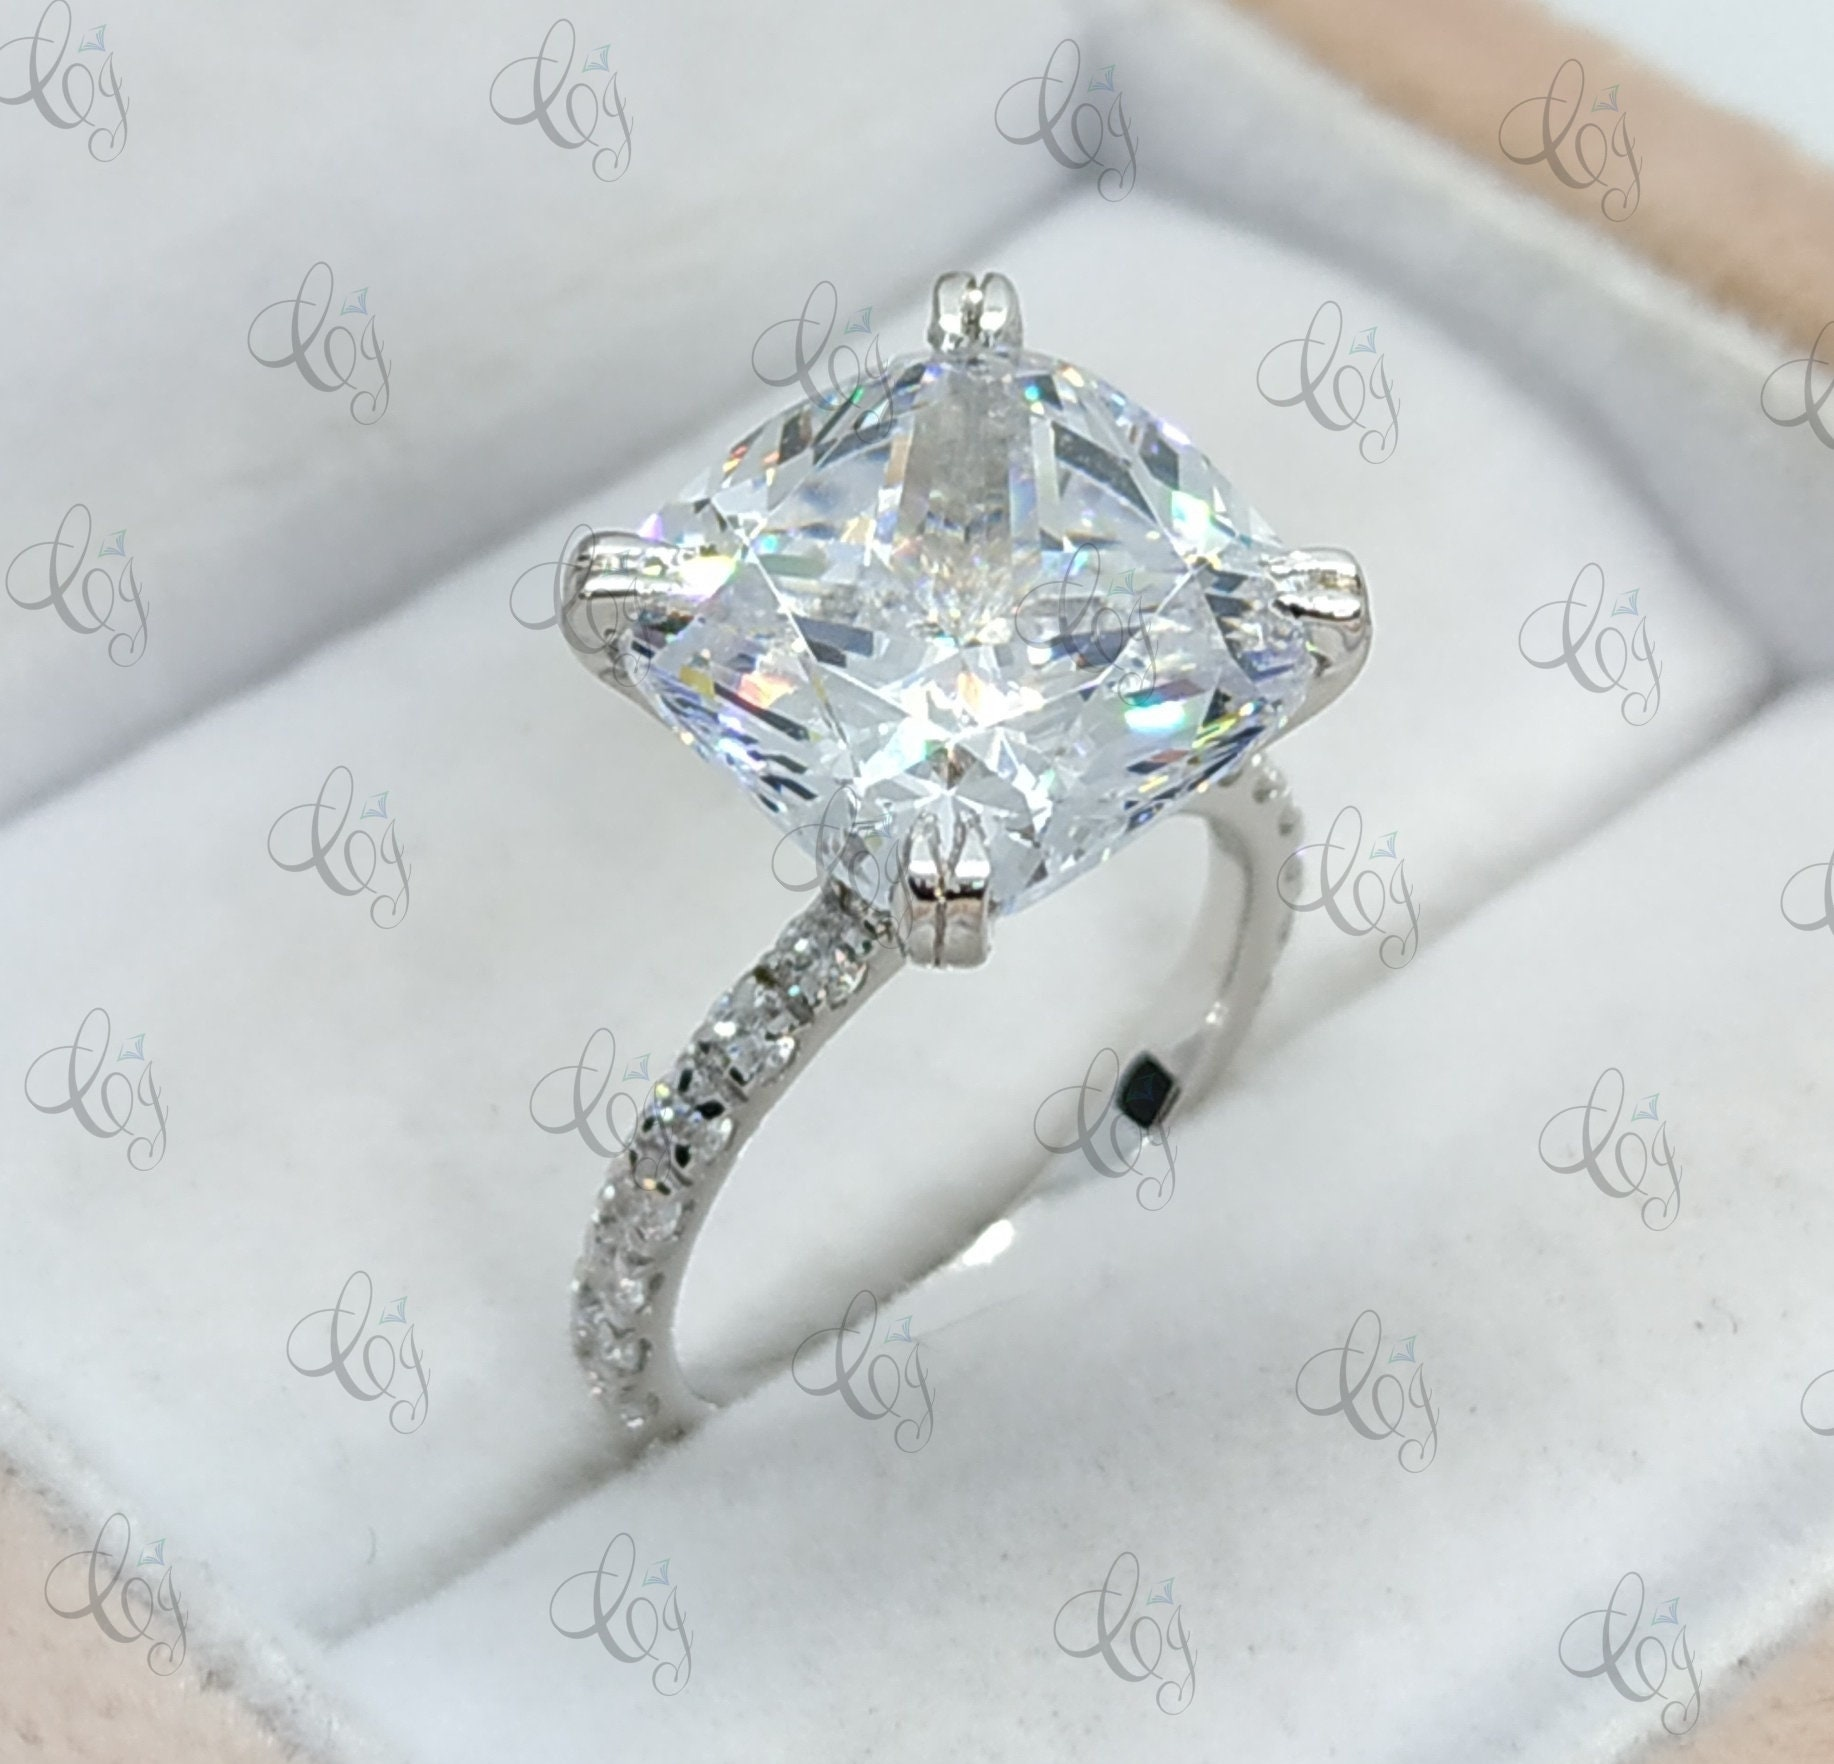 50 Ct Fancy Cocktail Asscher Cut Engagement Wedding Ring 925 Sterling Silver